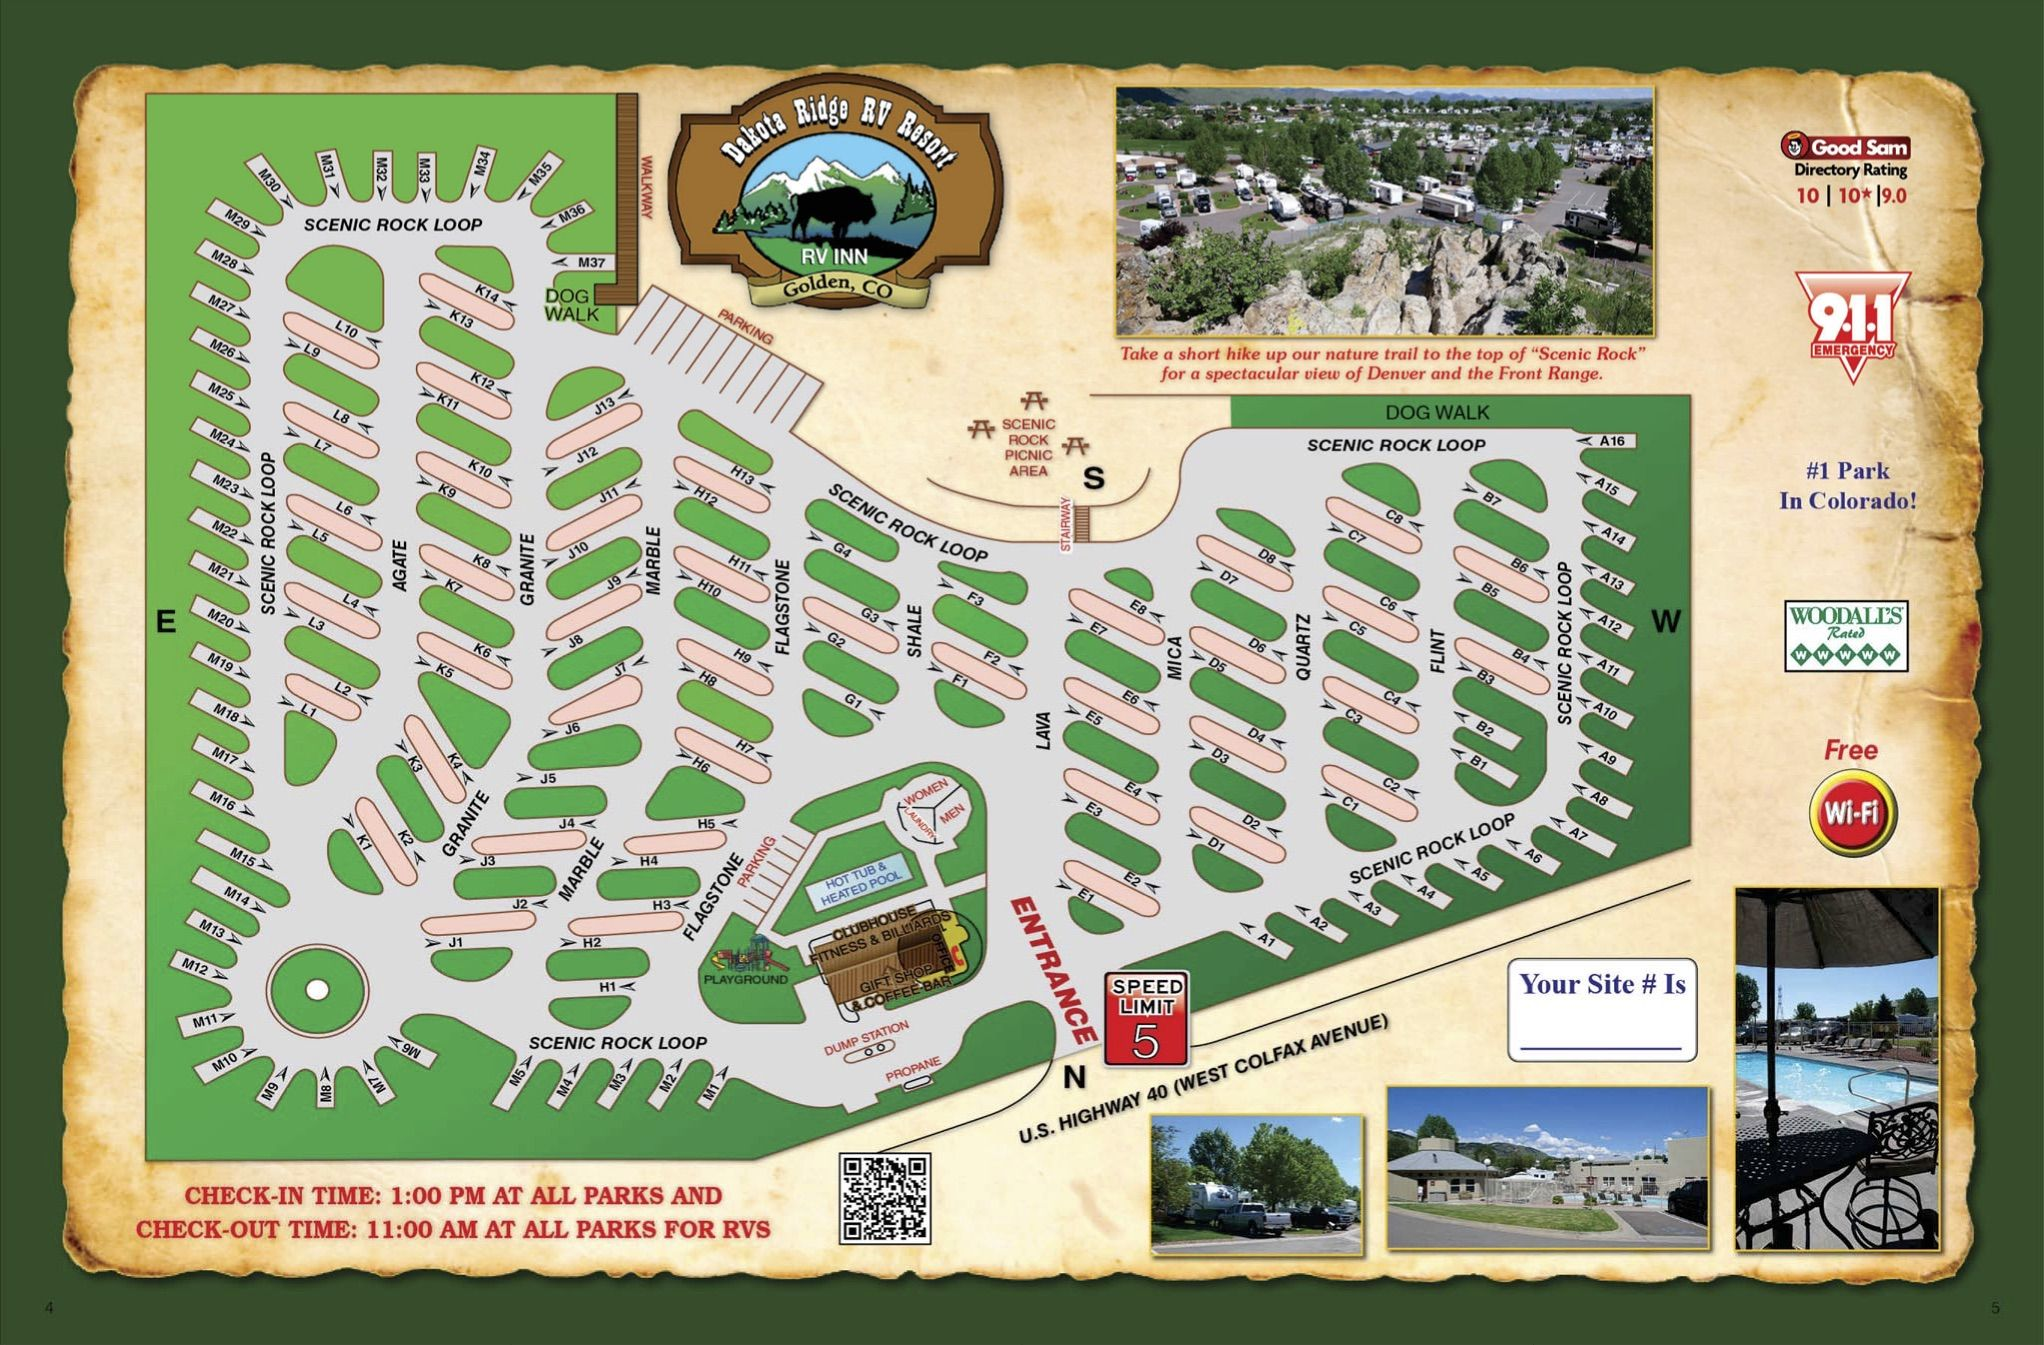 Campground Map Dakota Ridge Rv Resort 17800 West Colfax Avenue Golden Co 80401 With Images Rv Parks Recreational Vehicles Rv Travel